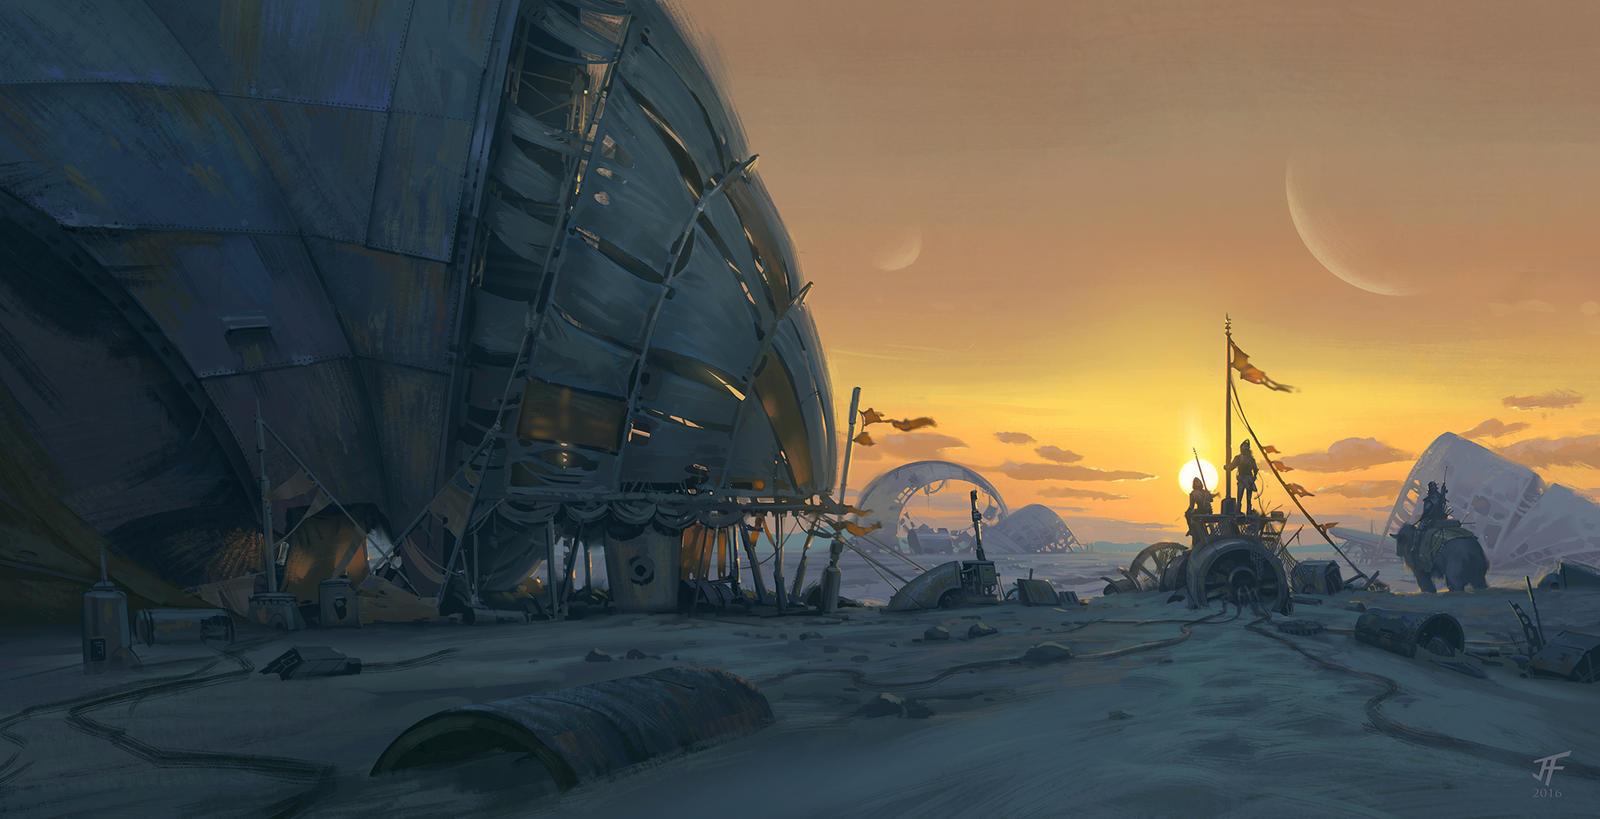 Desert Camp by JeremyFenske